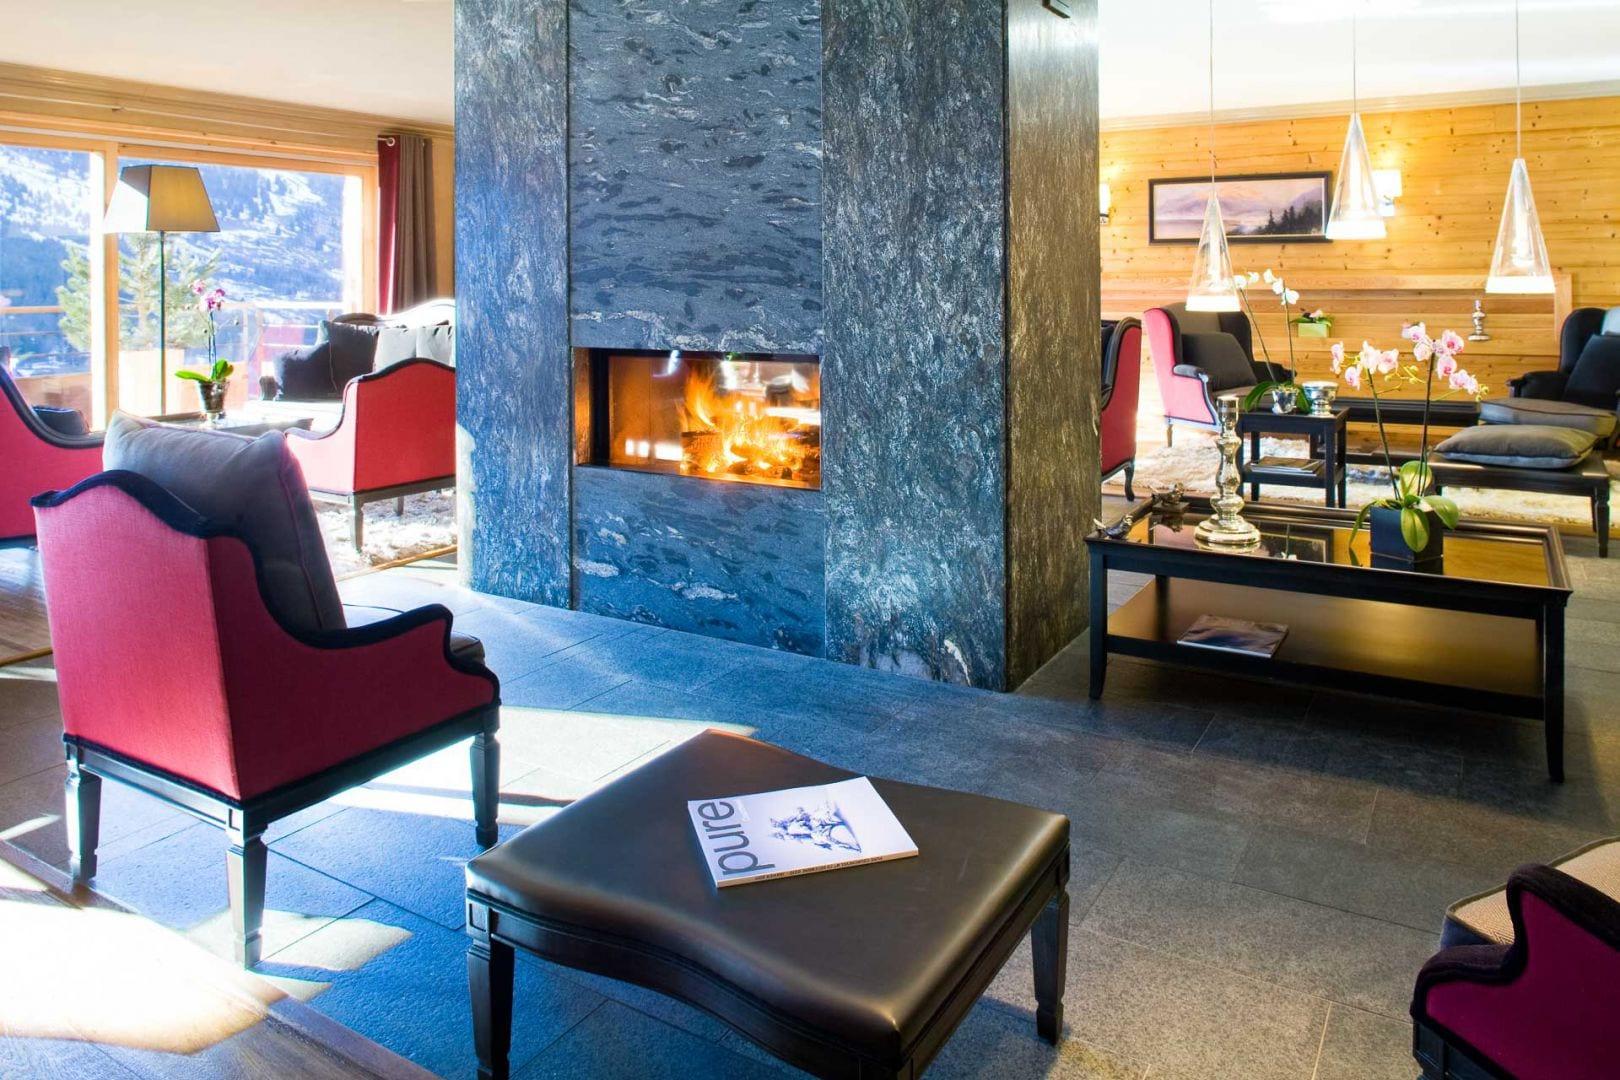 helios-hotel-meribel-28858-big